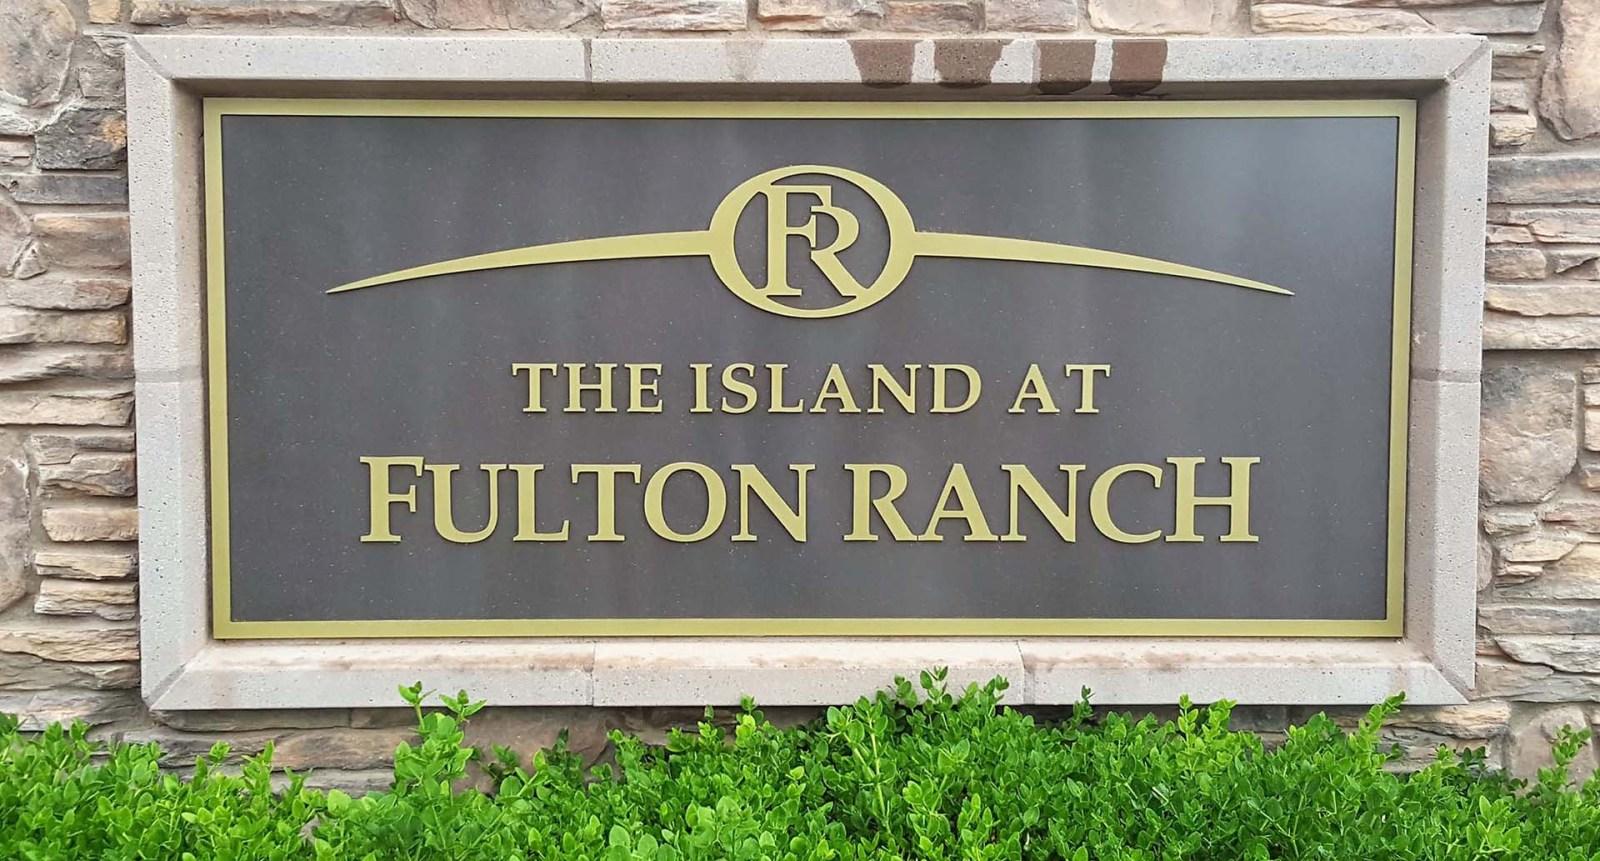 The Island at Fulton Ranch